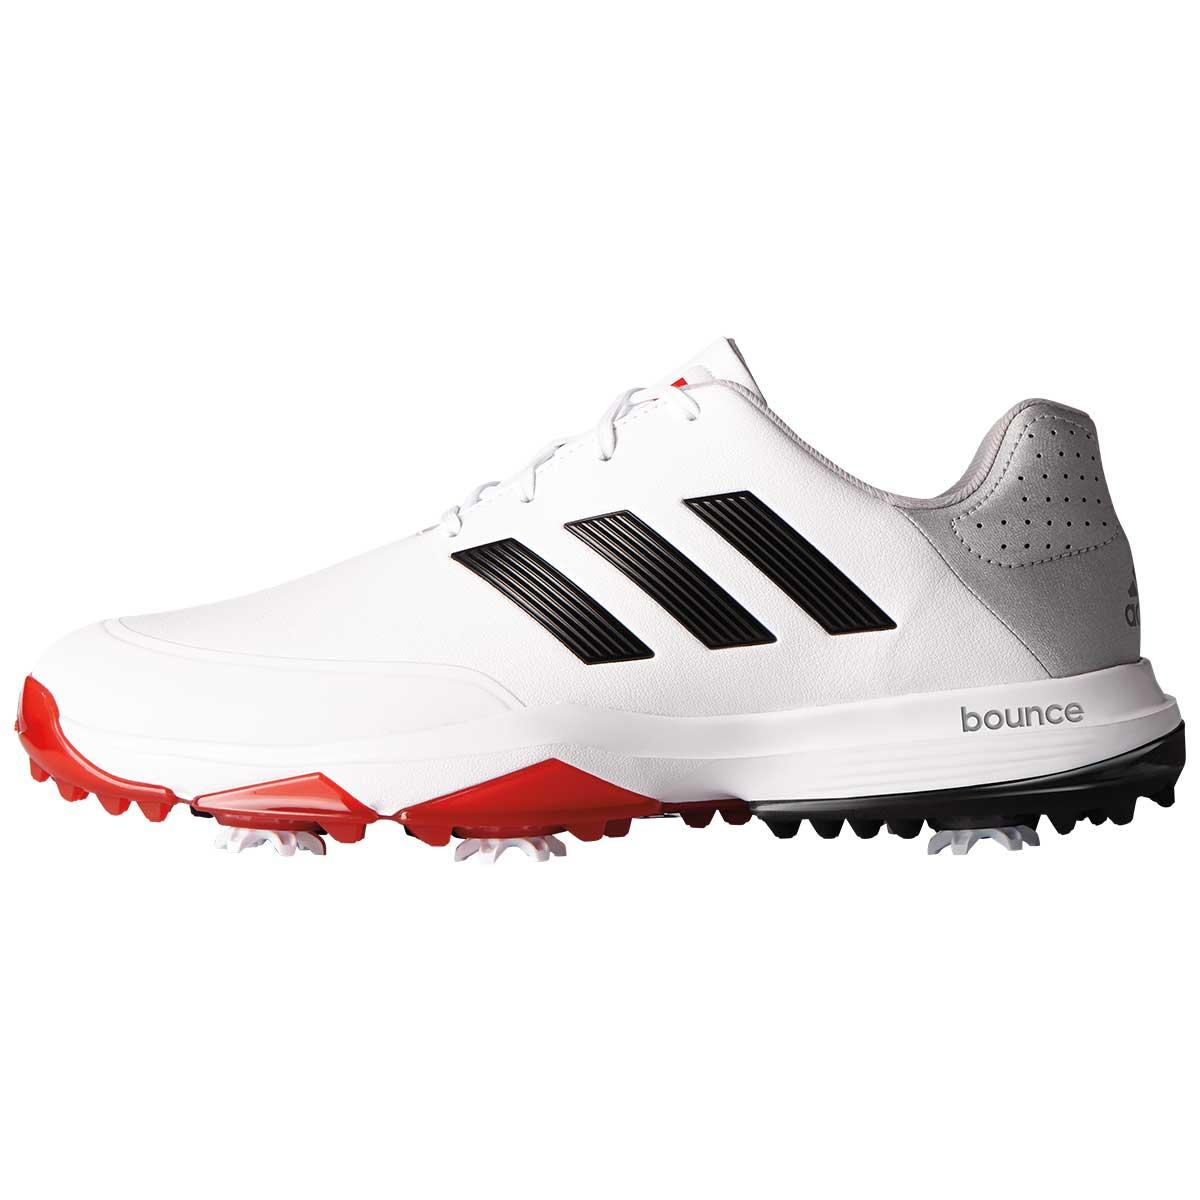 adidas Men's AdiPower Bounce Golf Shoe - White/Black/Scarlet